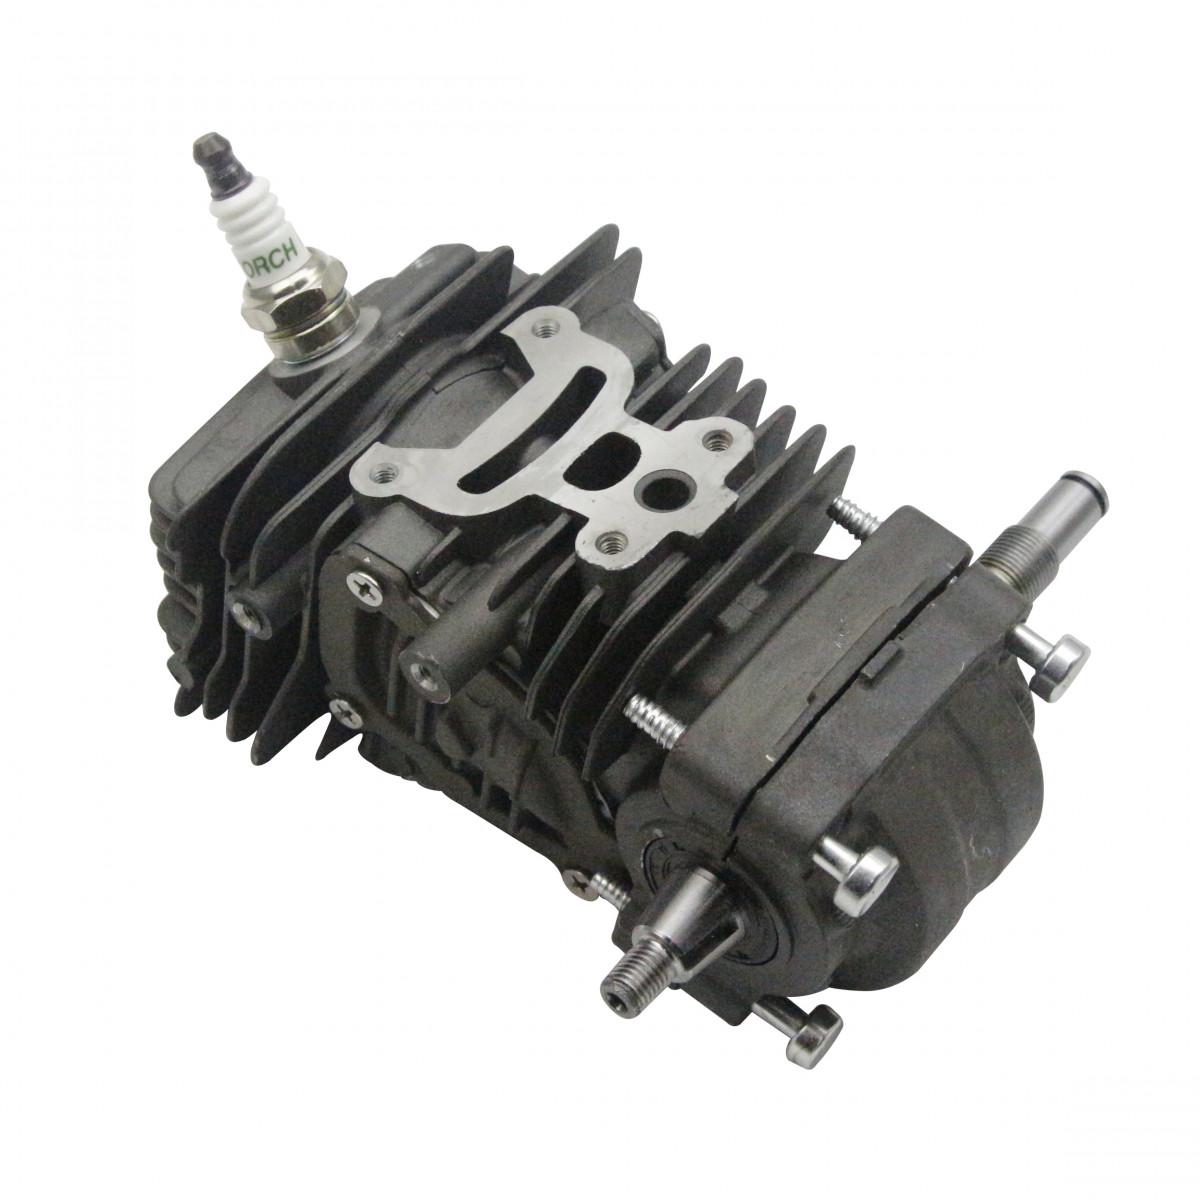 Polomotor Stihl MS171 MS181 MS181C MS211